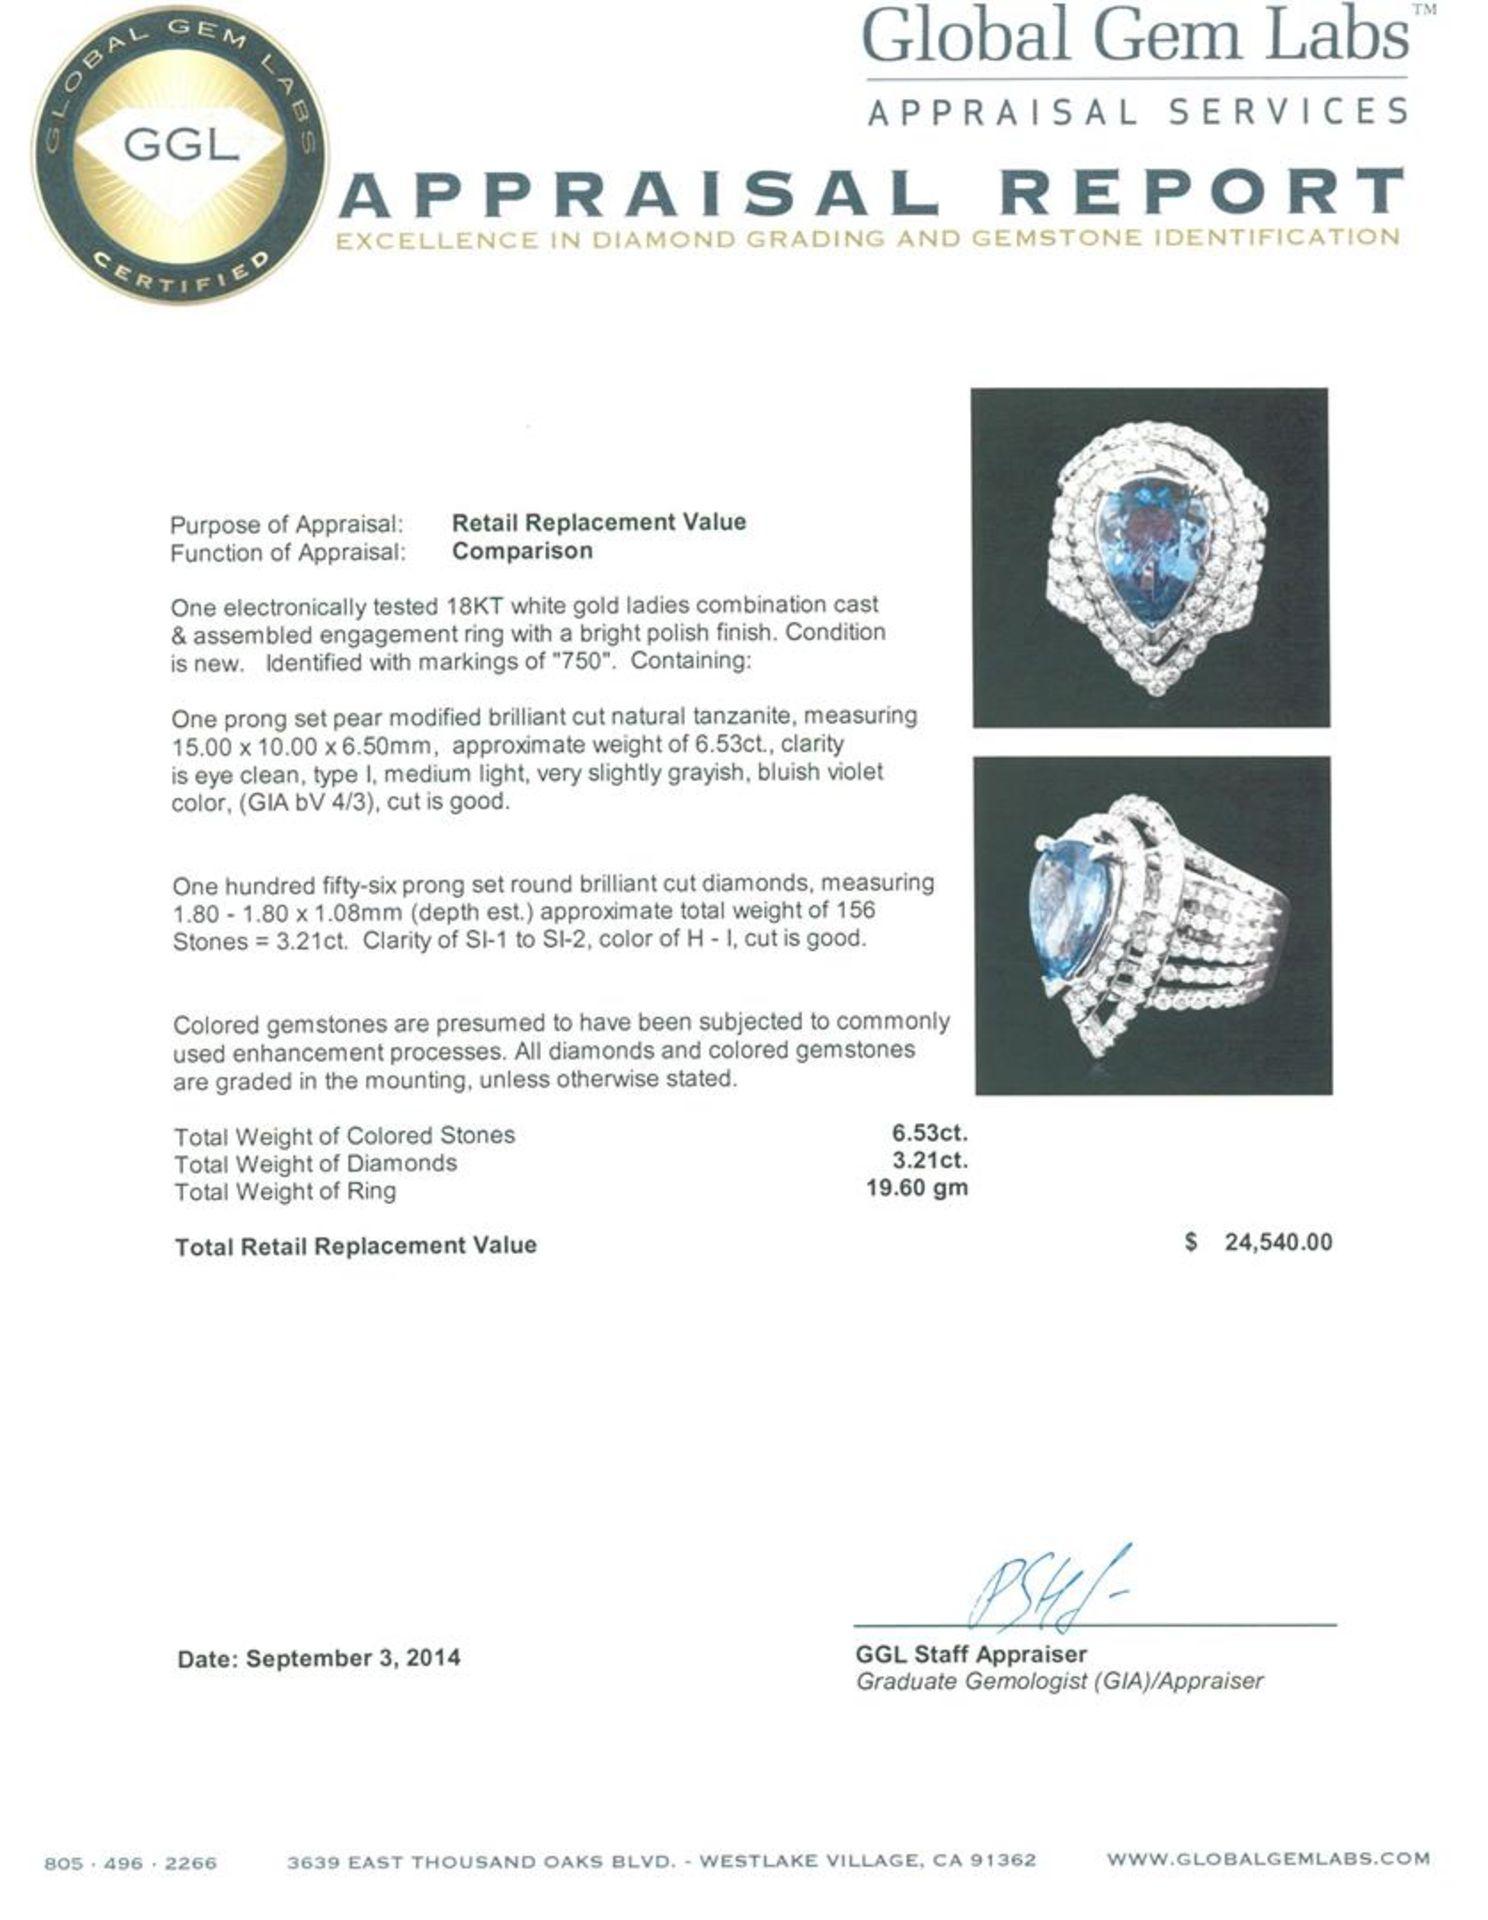 18KT White Gold 6.53ct Tanzanite and Diamond Ring - Image 3 of 3